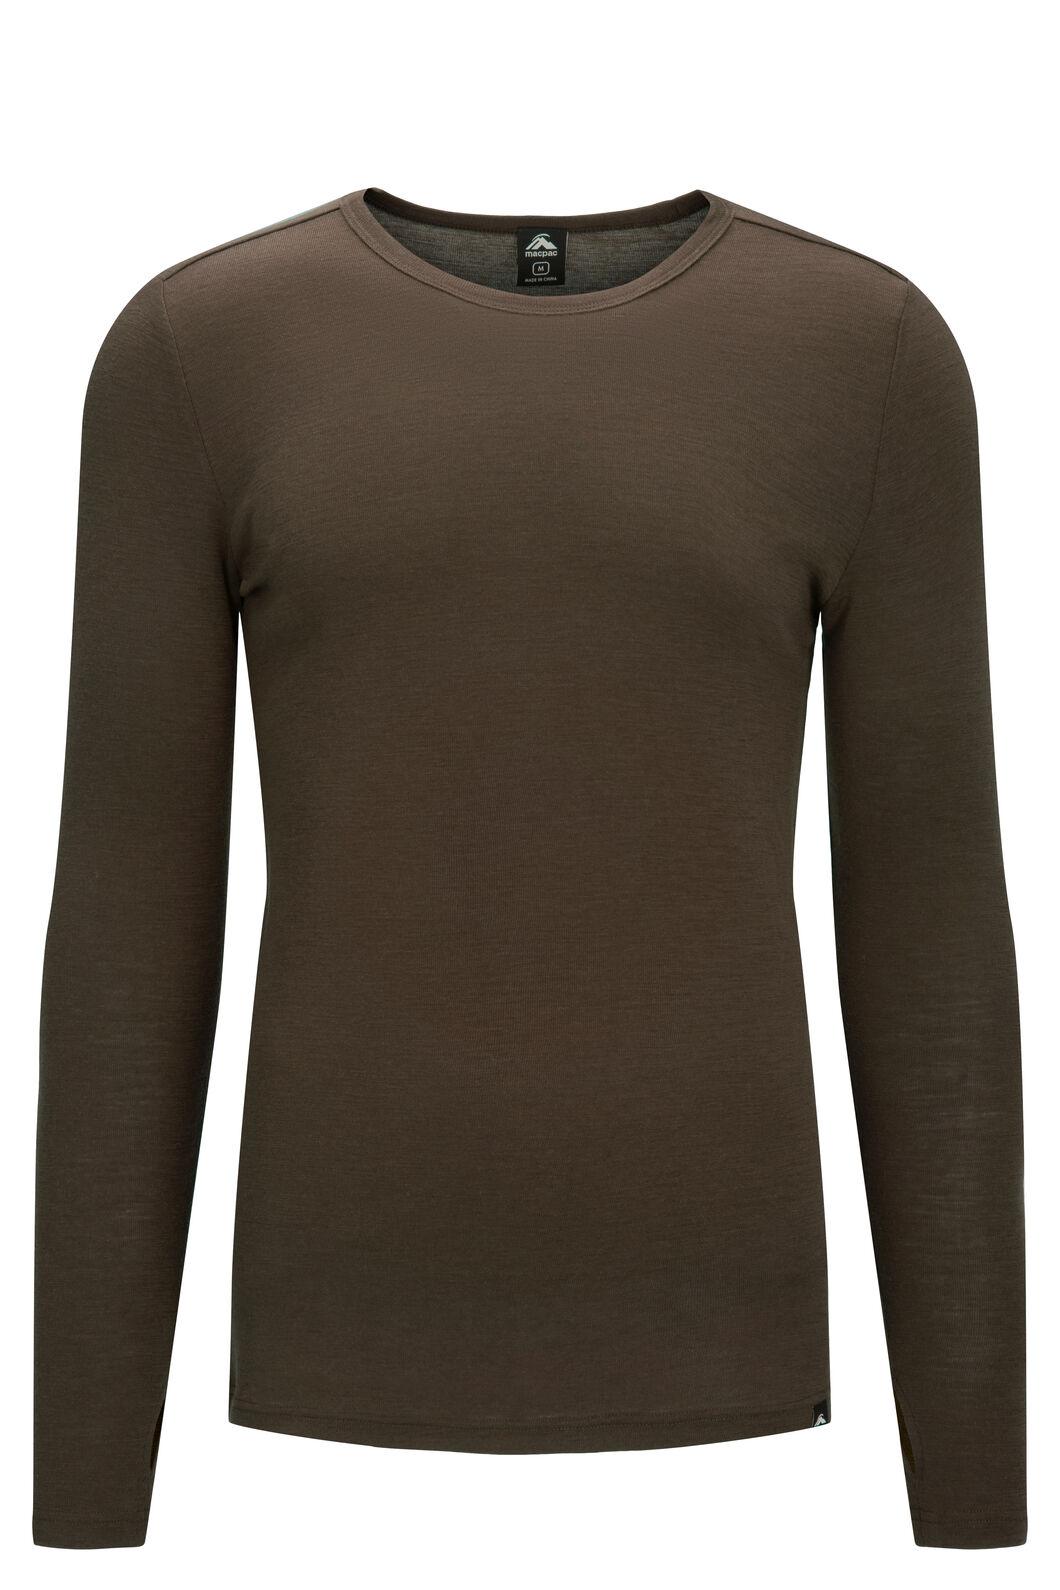 Macpac Men's 220 Merino Long Sleeve Top, Olive Night, hi-res